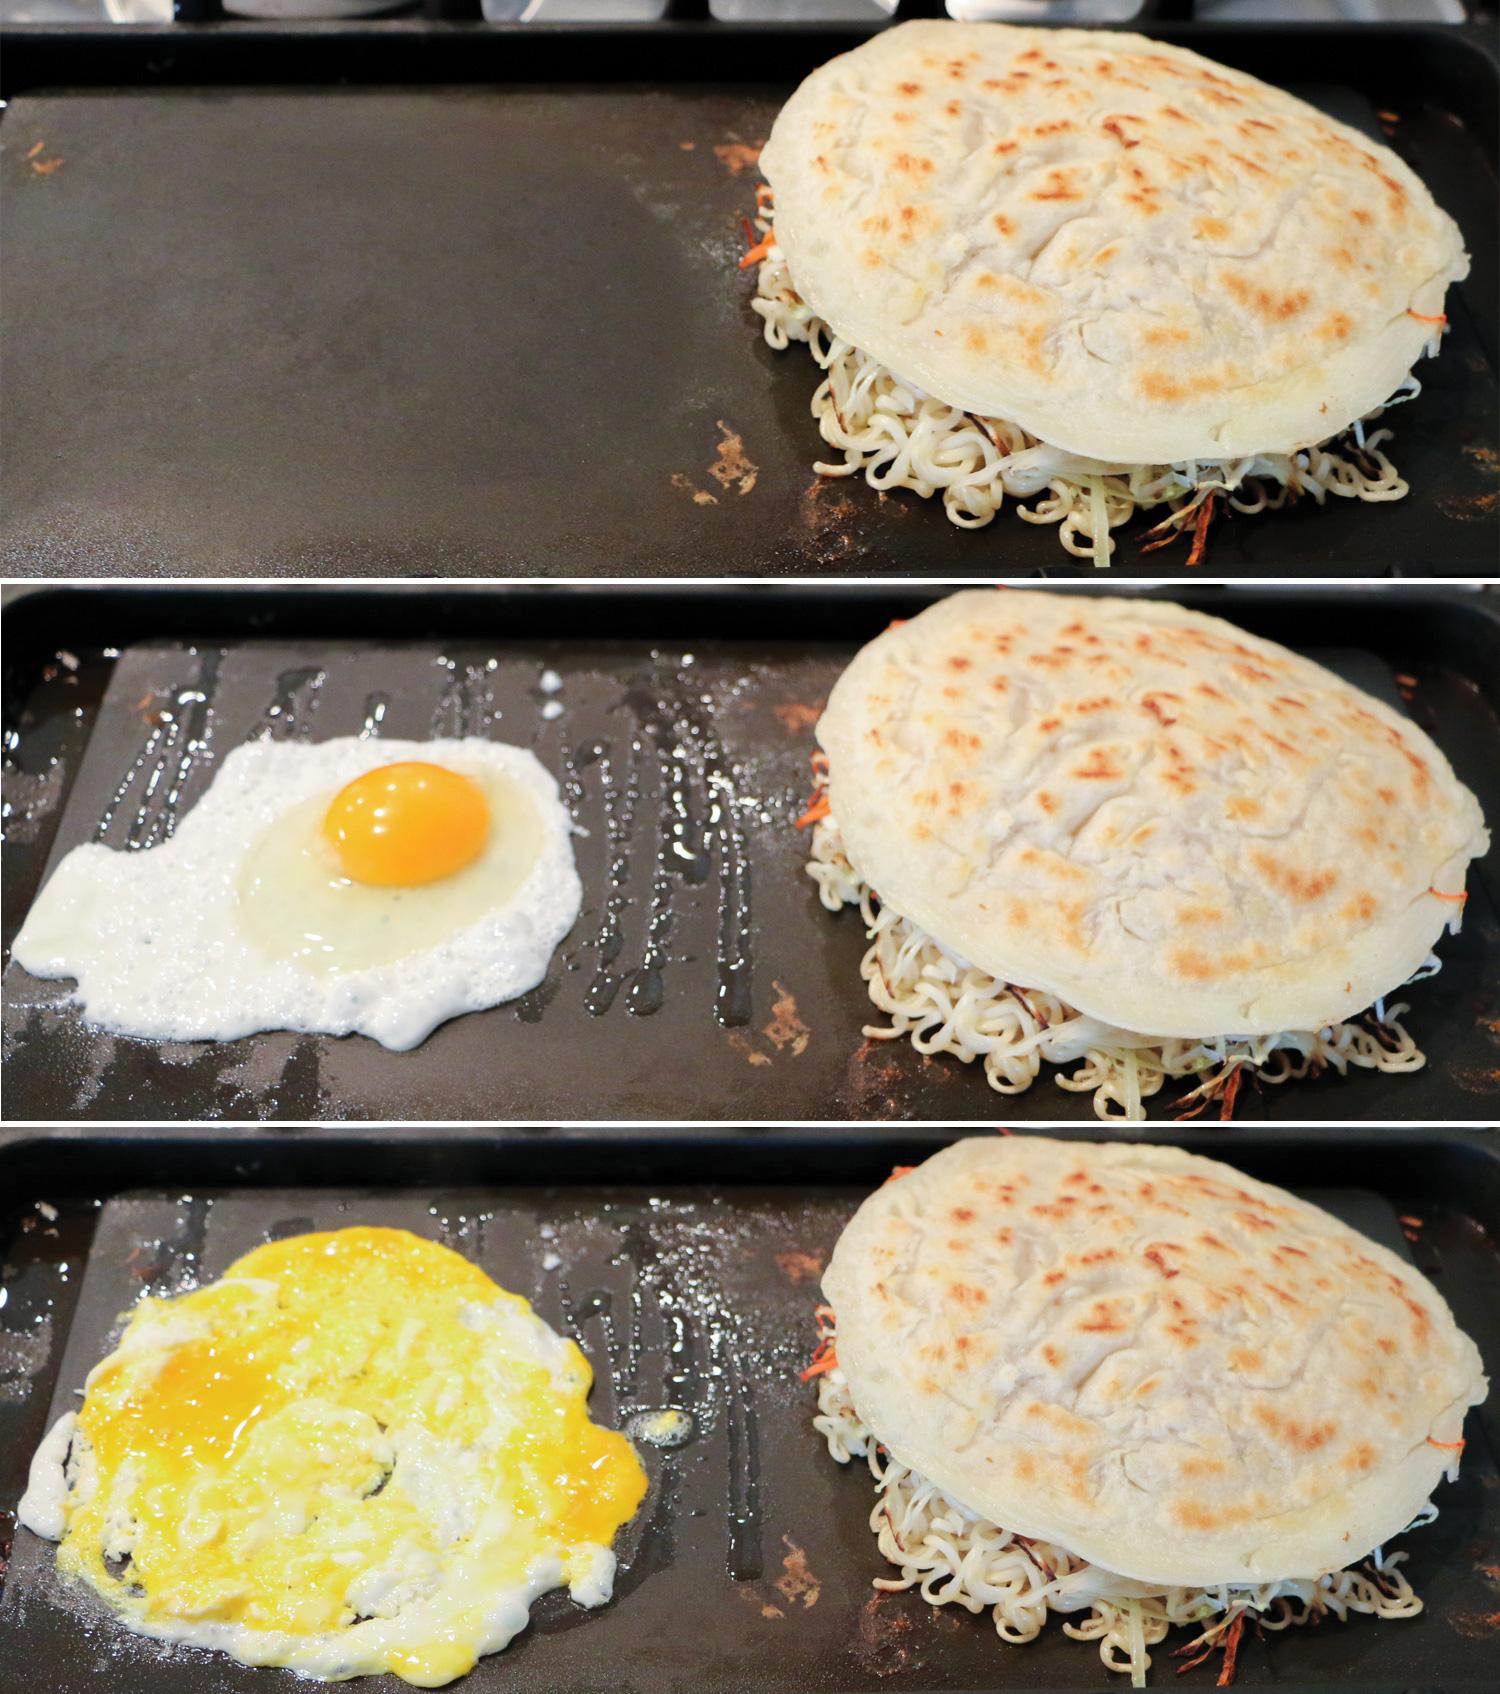 Steps to Make Hiroshima Style Okonomiyaki on a Griddle